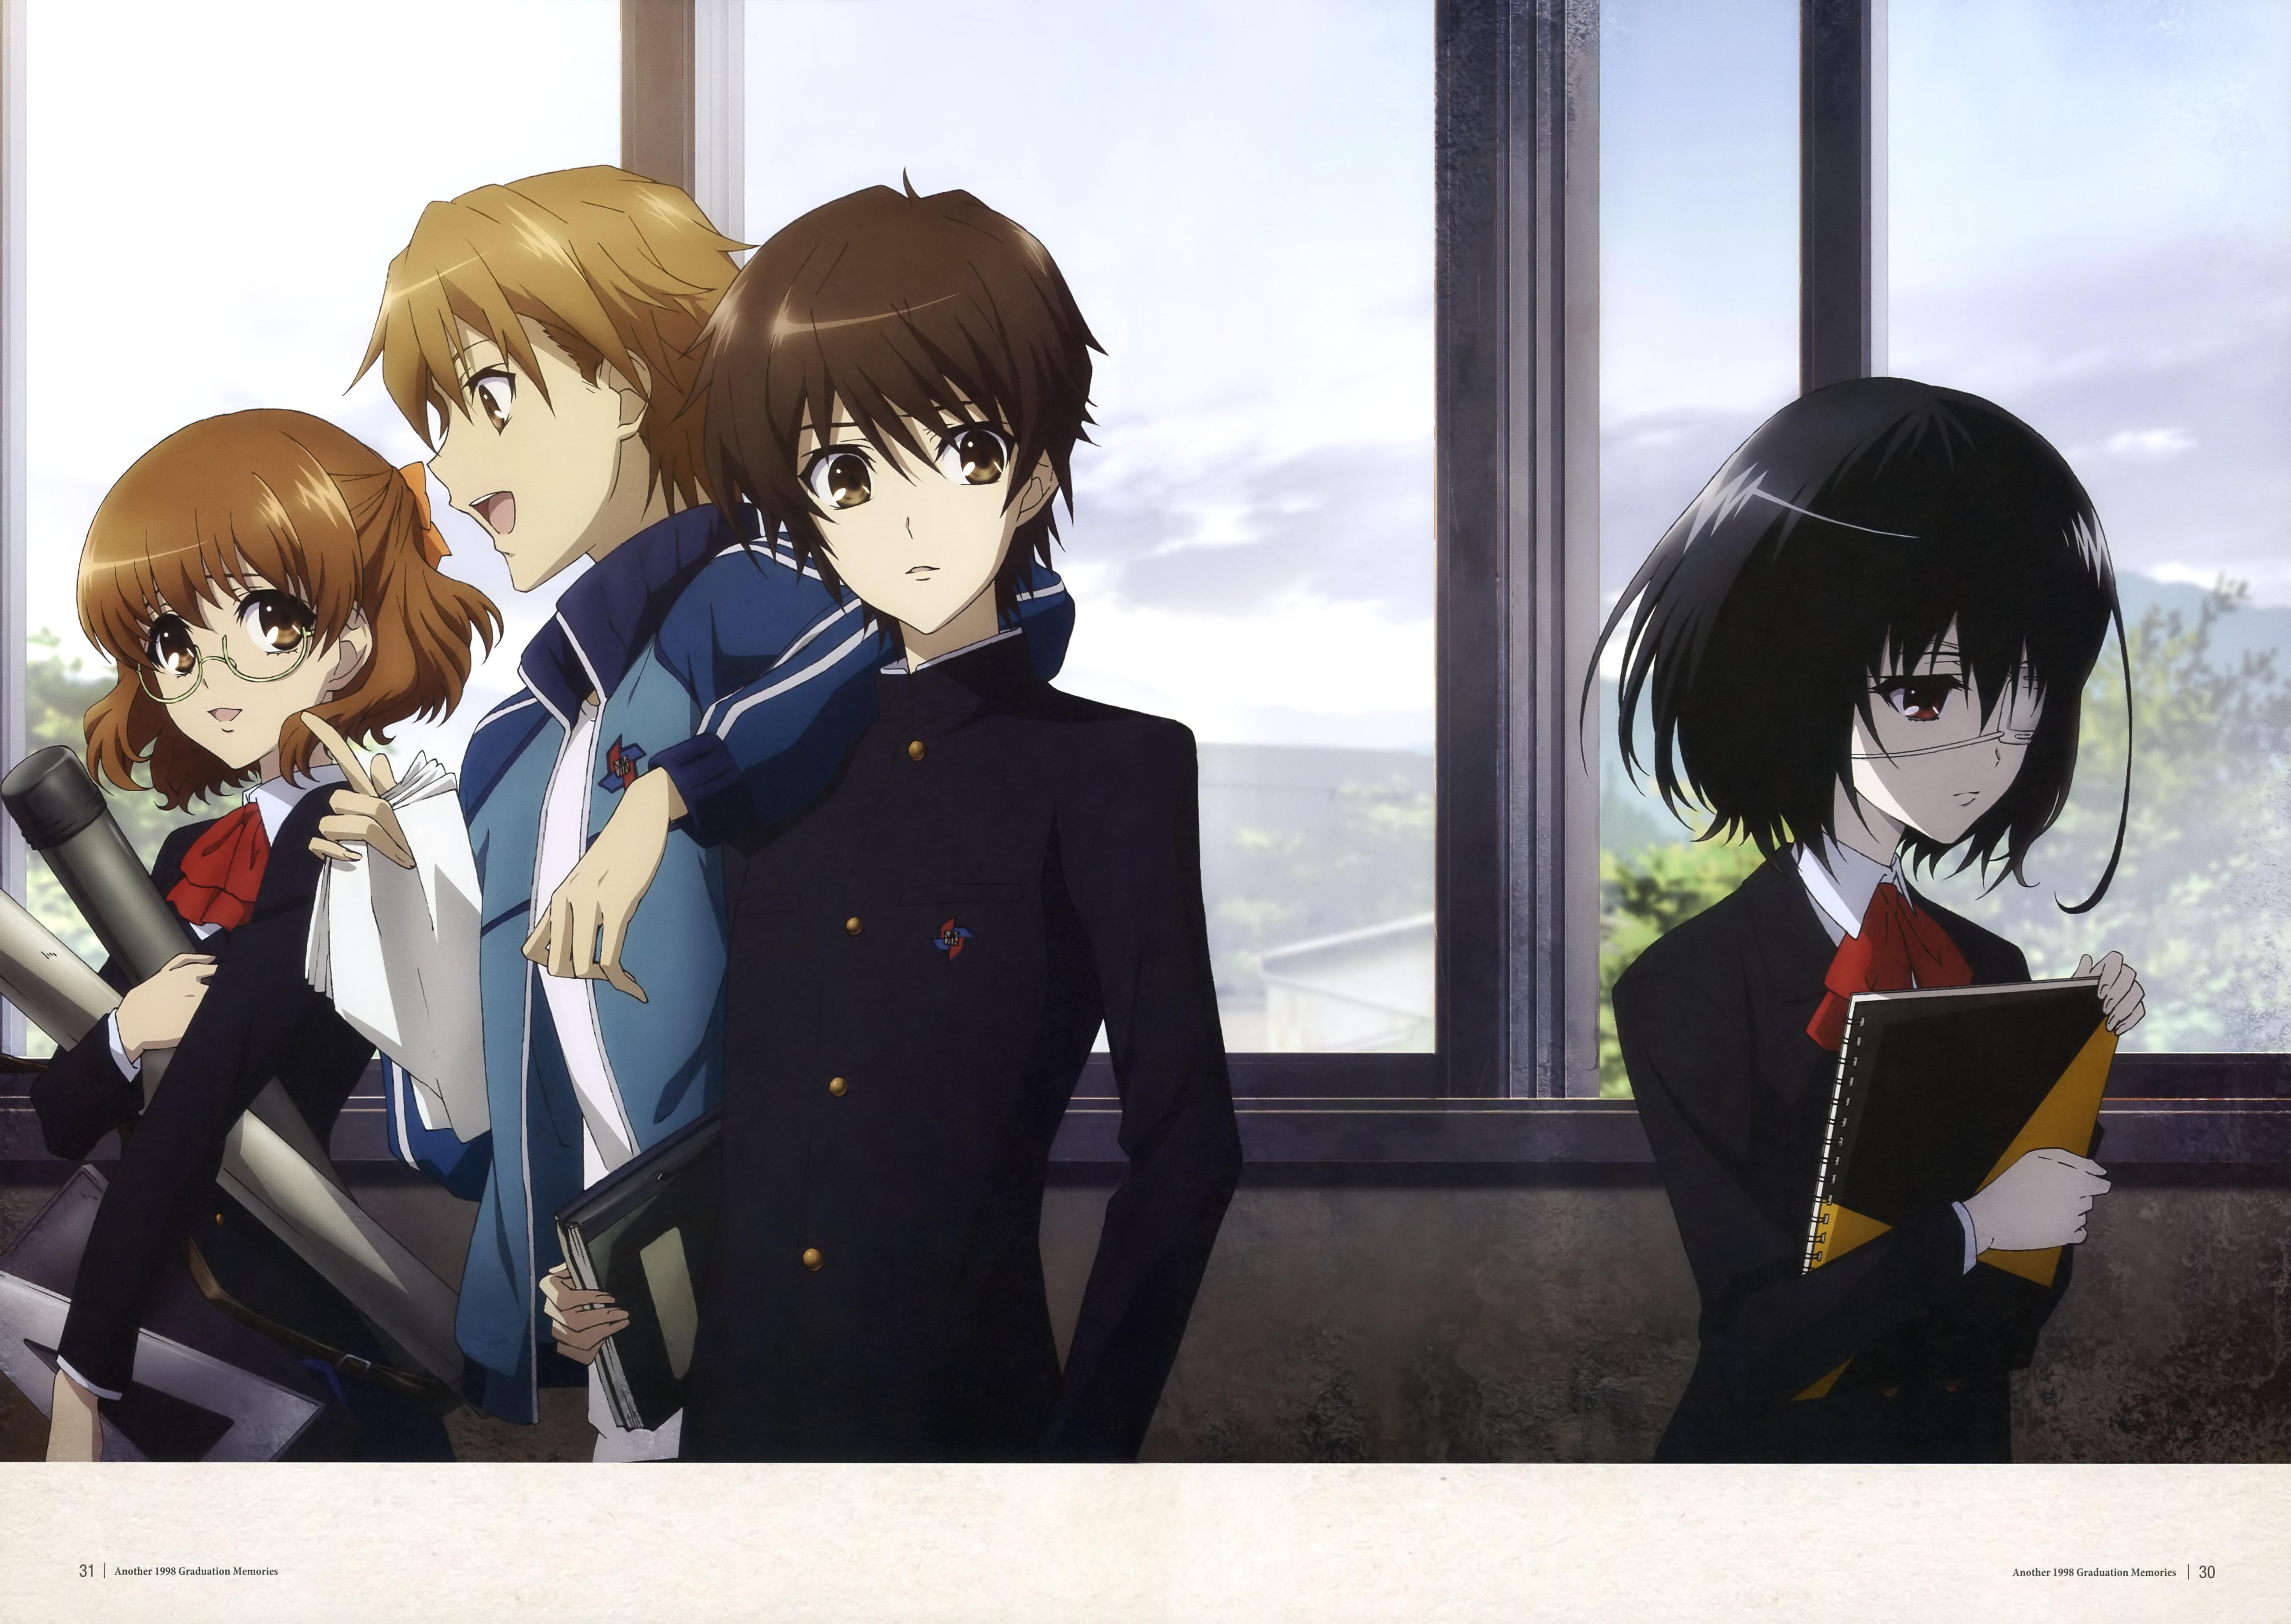 X And Y Anime Characters : Another galería wakaranainofansub